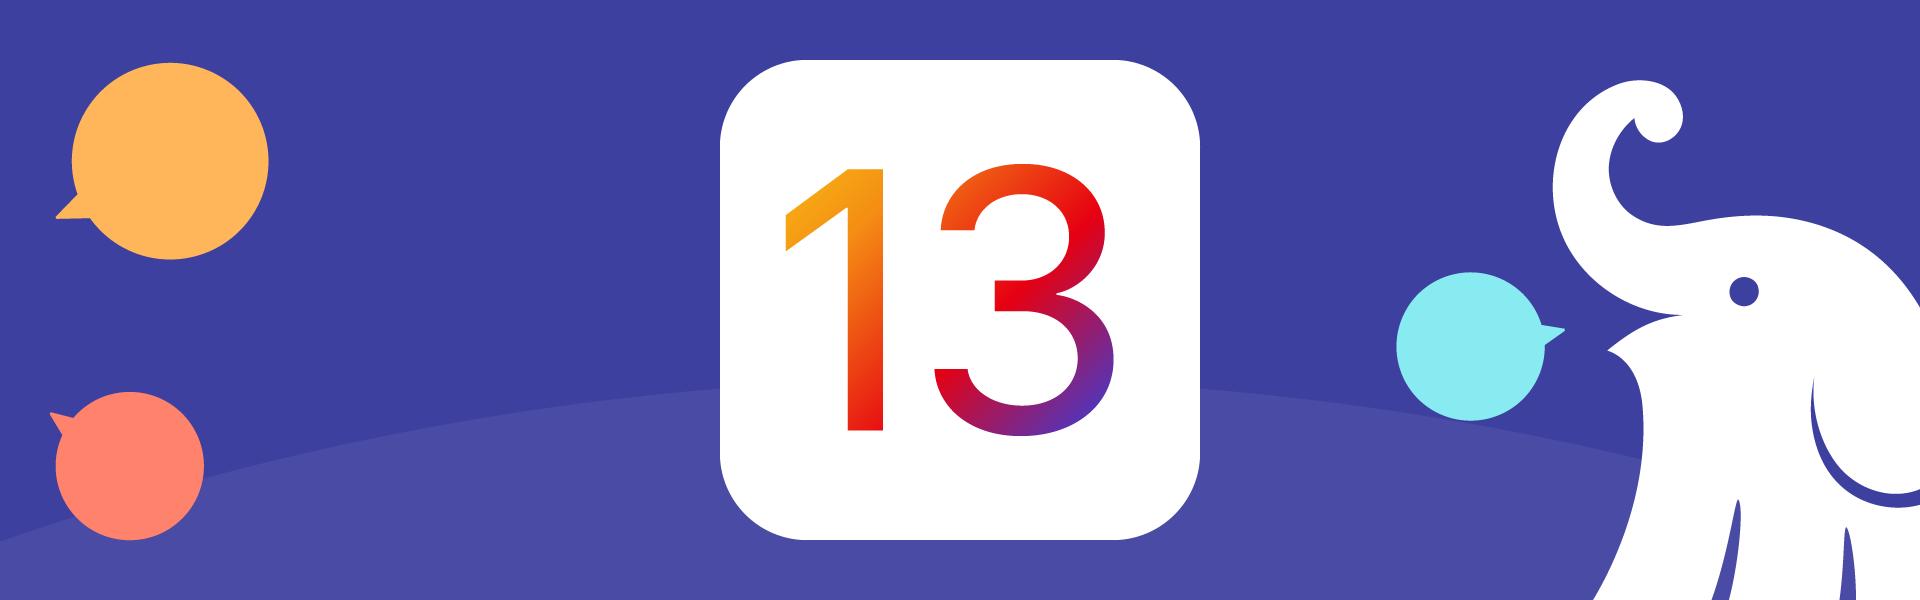 PressRelease iOS13